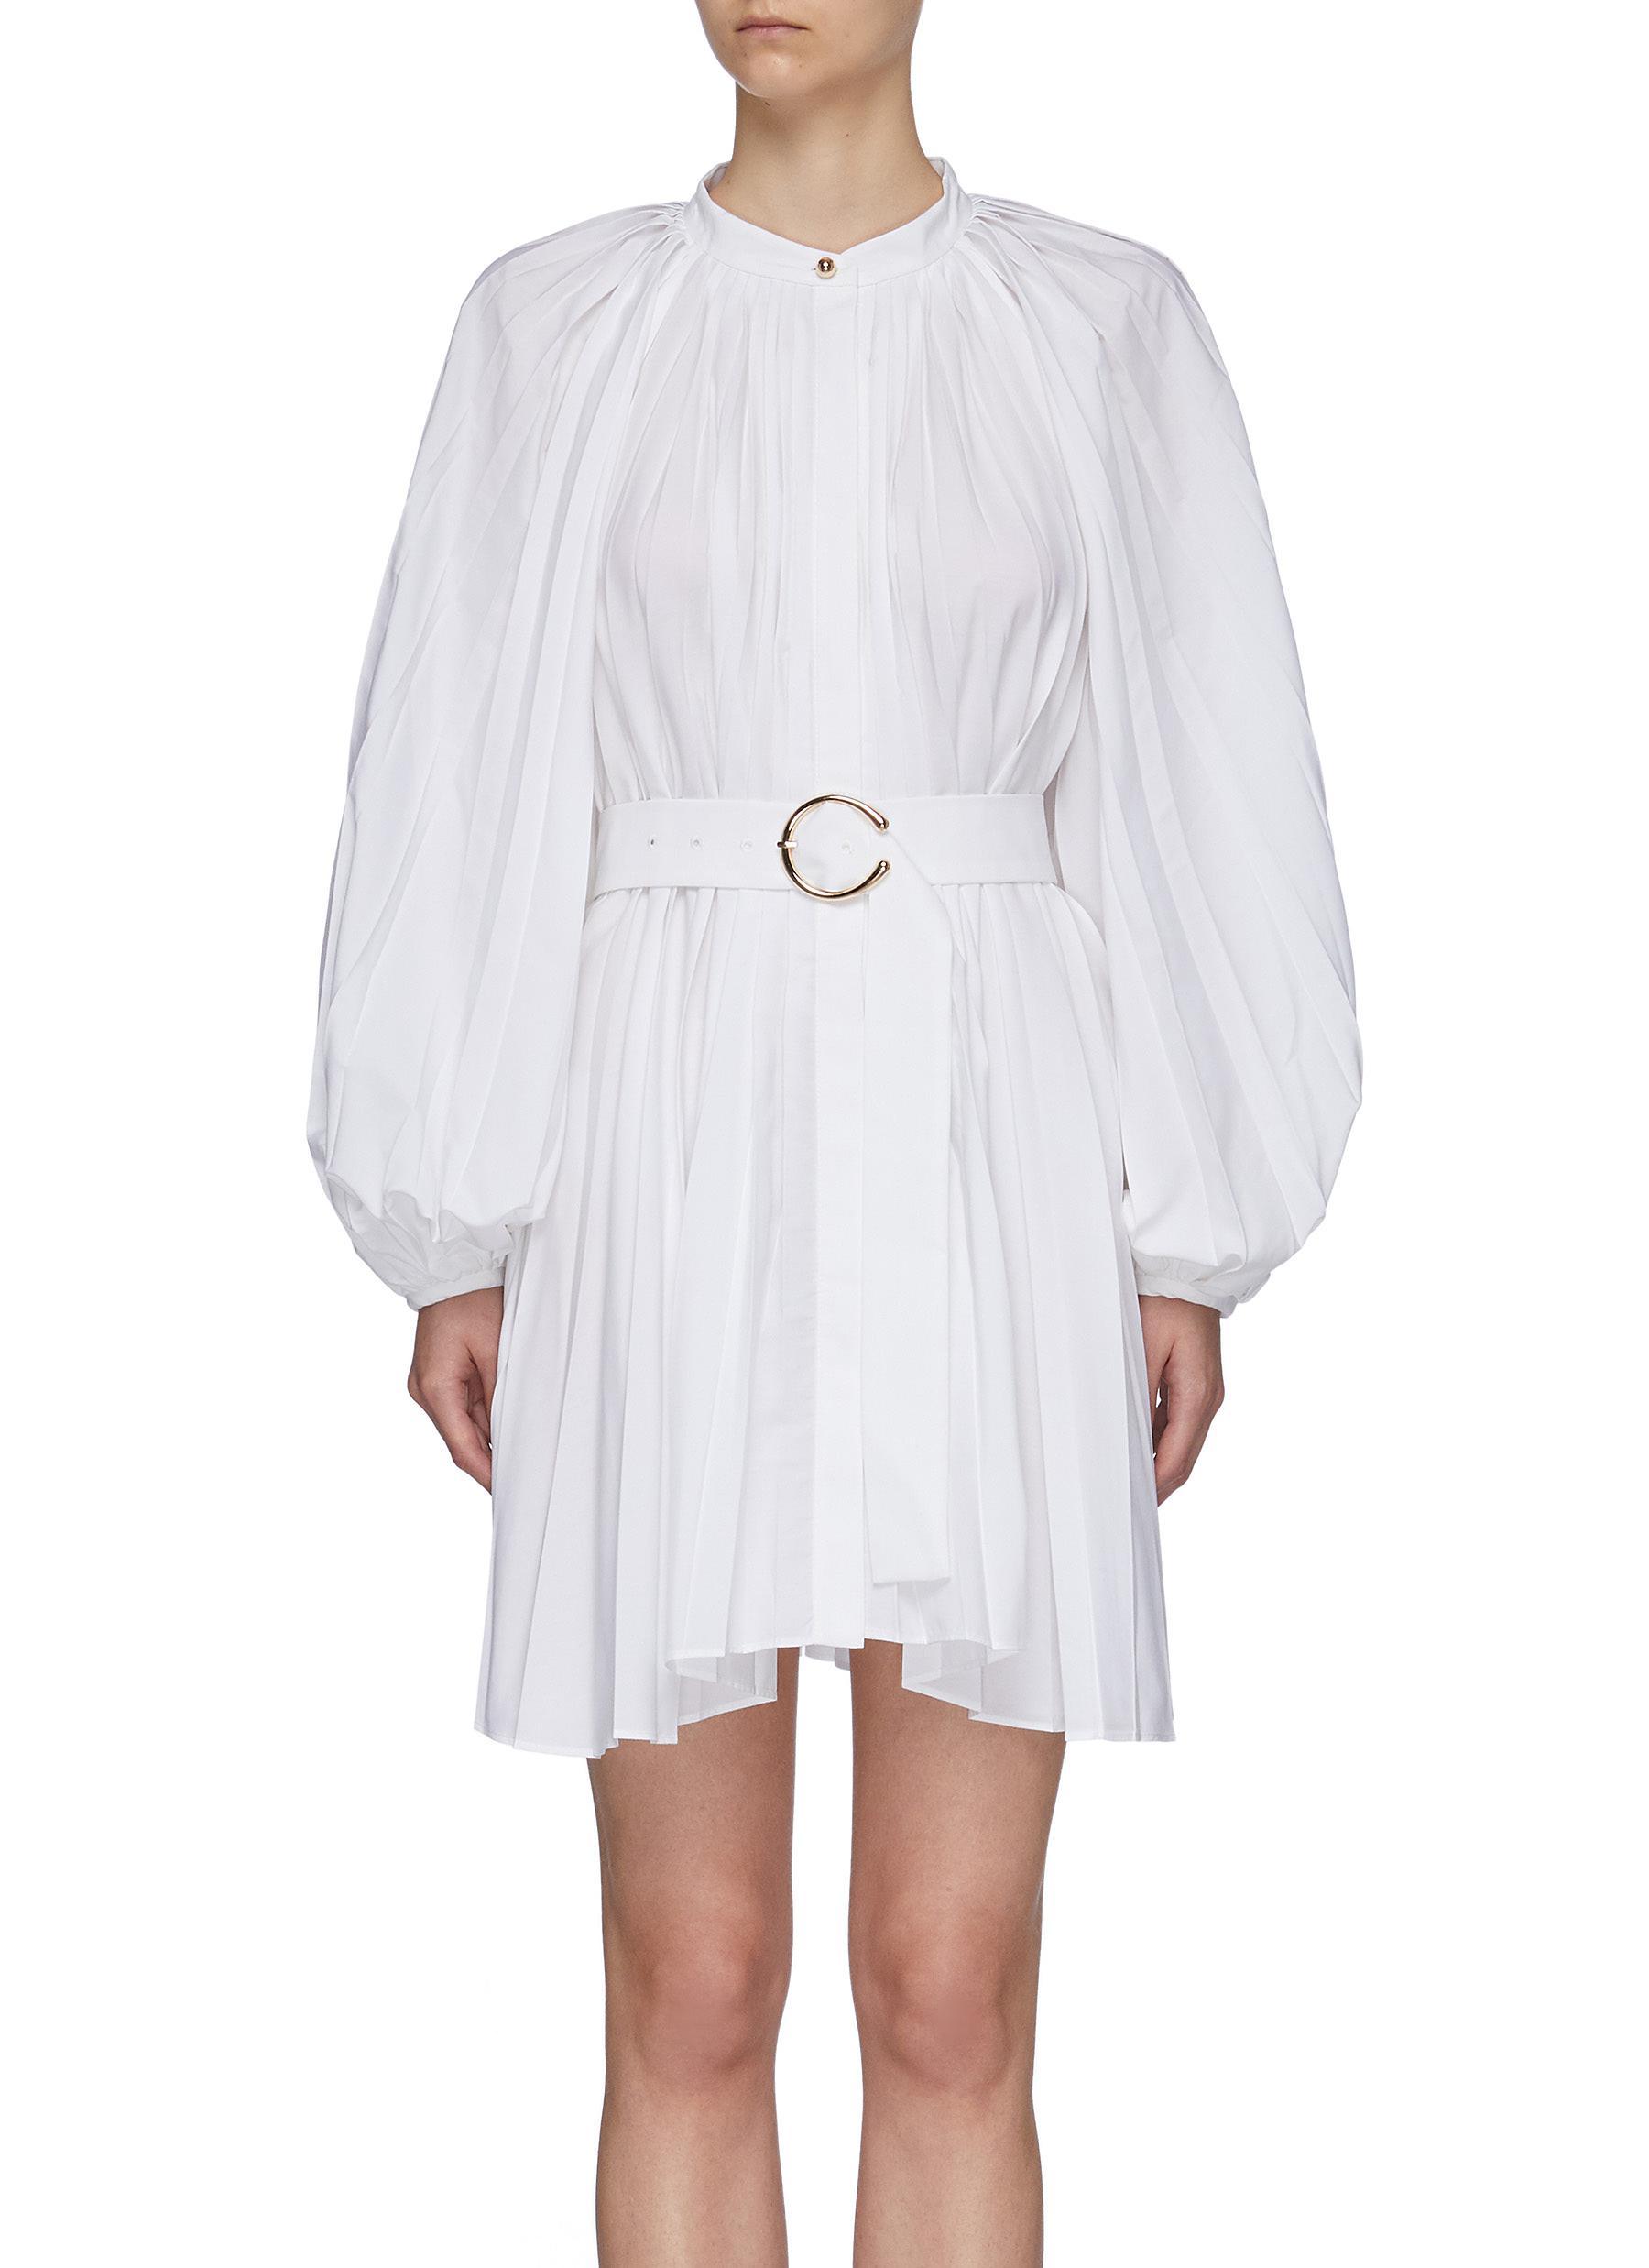 'Margot' Belted Bishop Sleeve Pleated Shirt Dress